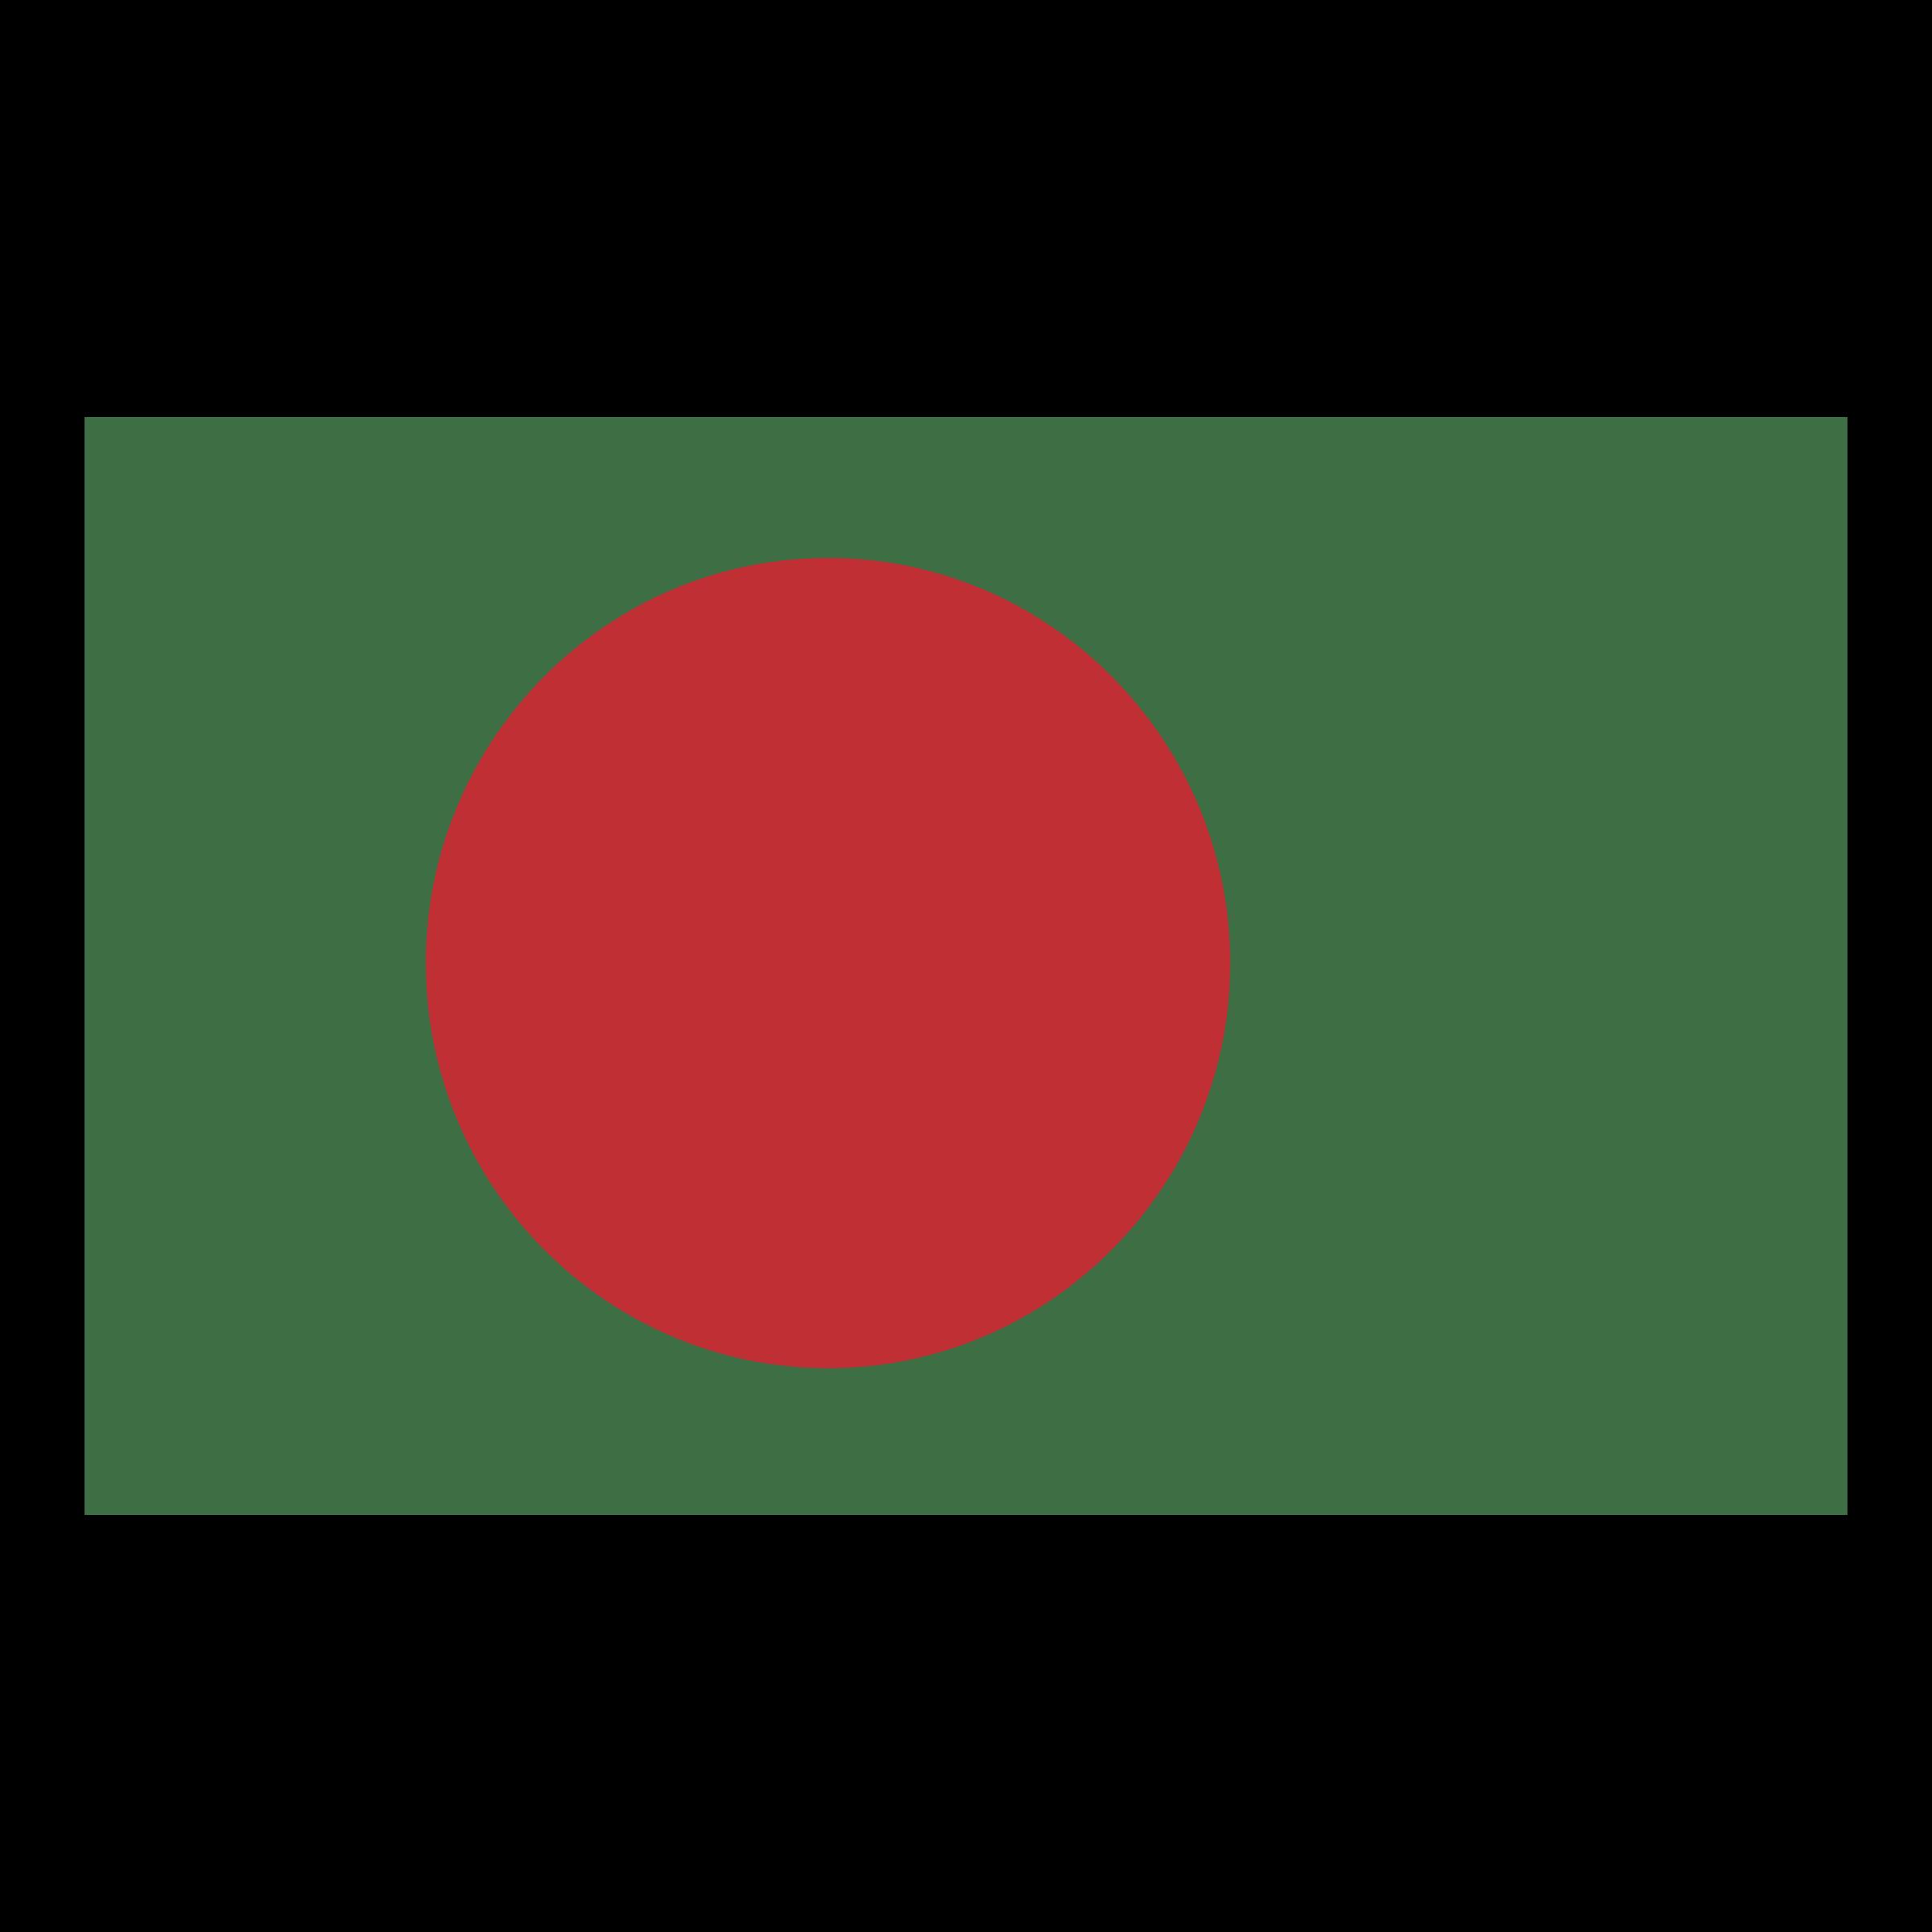 Bangladesh Logo PNG Transparent & SVG Vector.